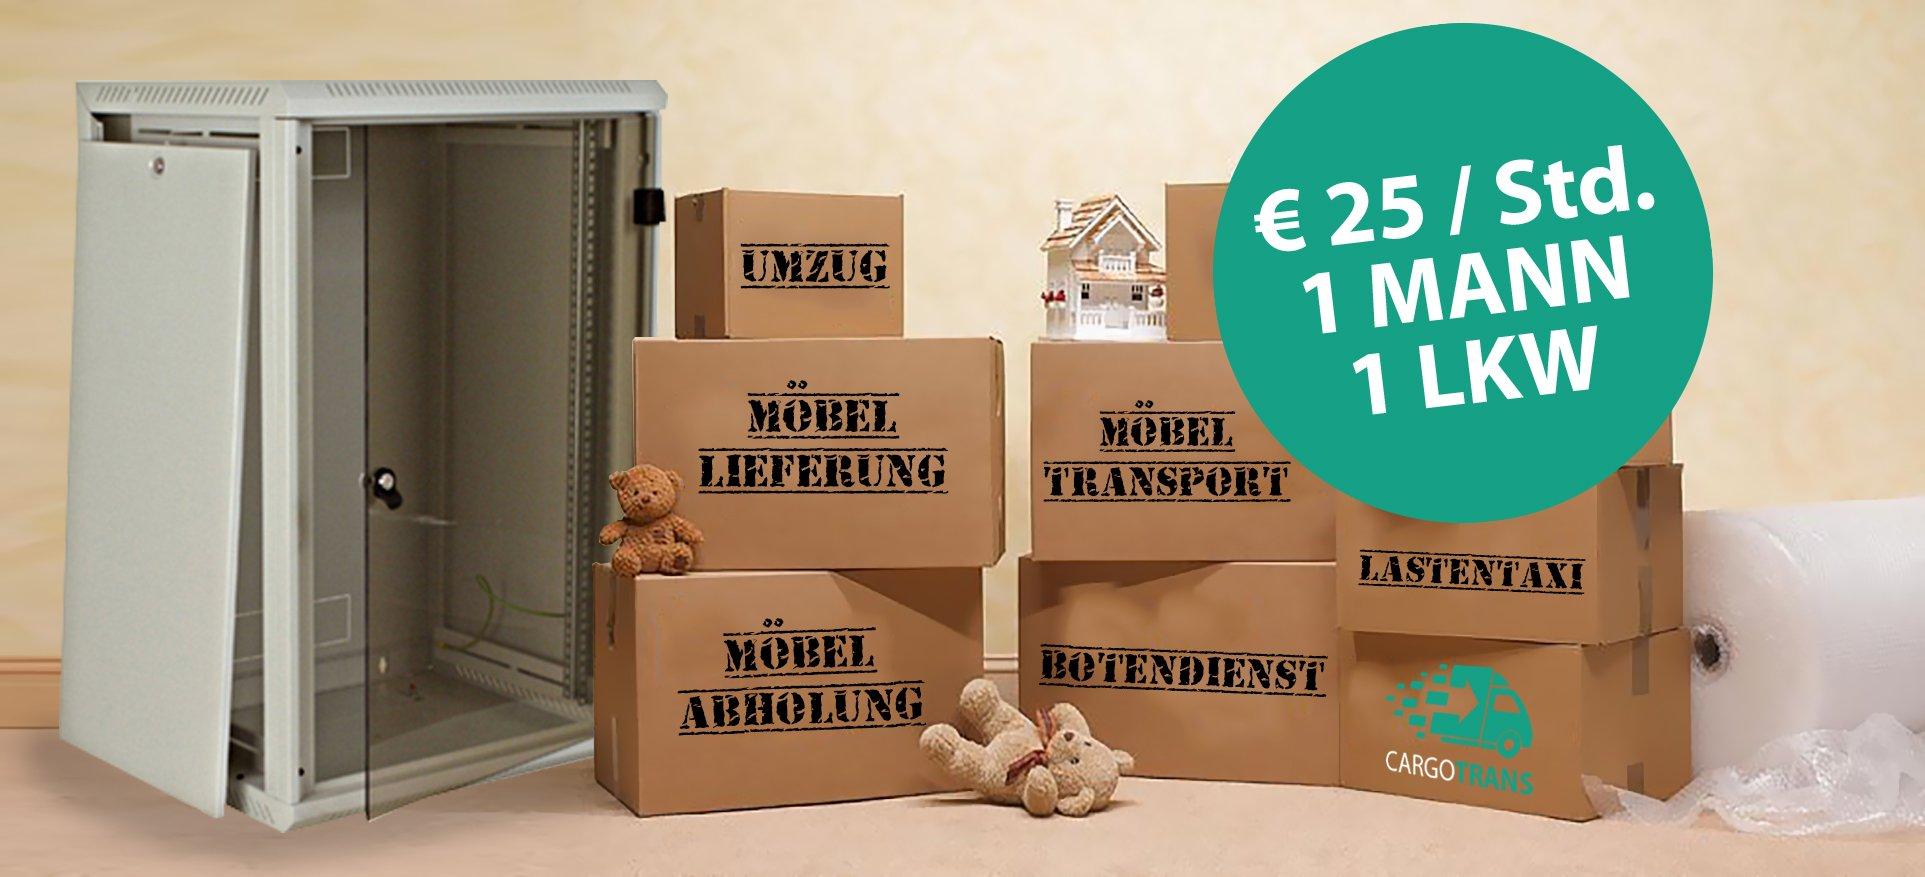 Möbeltransport Wien Umzug Wien Umzugsfirma Cargotransportat